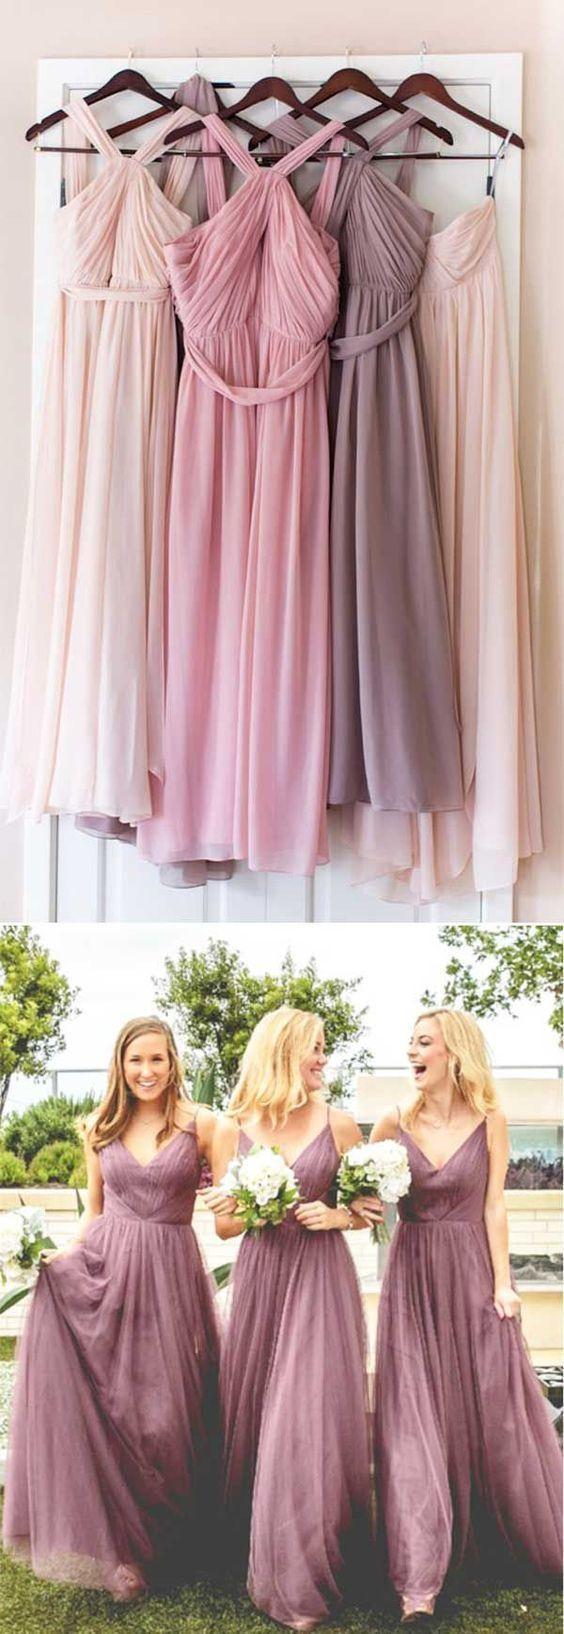 Elegant long floorlength dress for wedding party bridesmaid